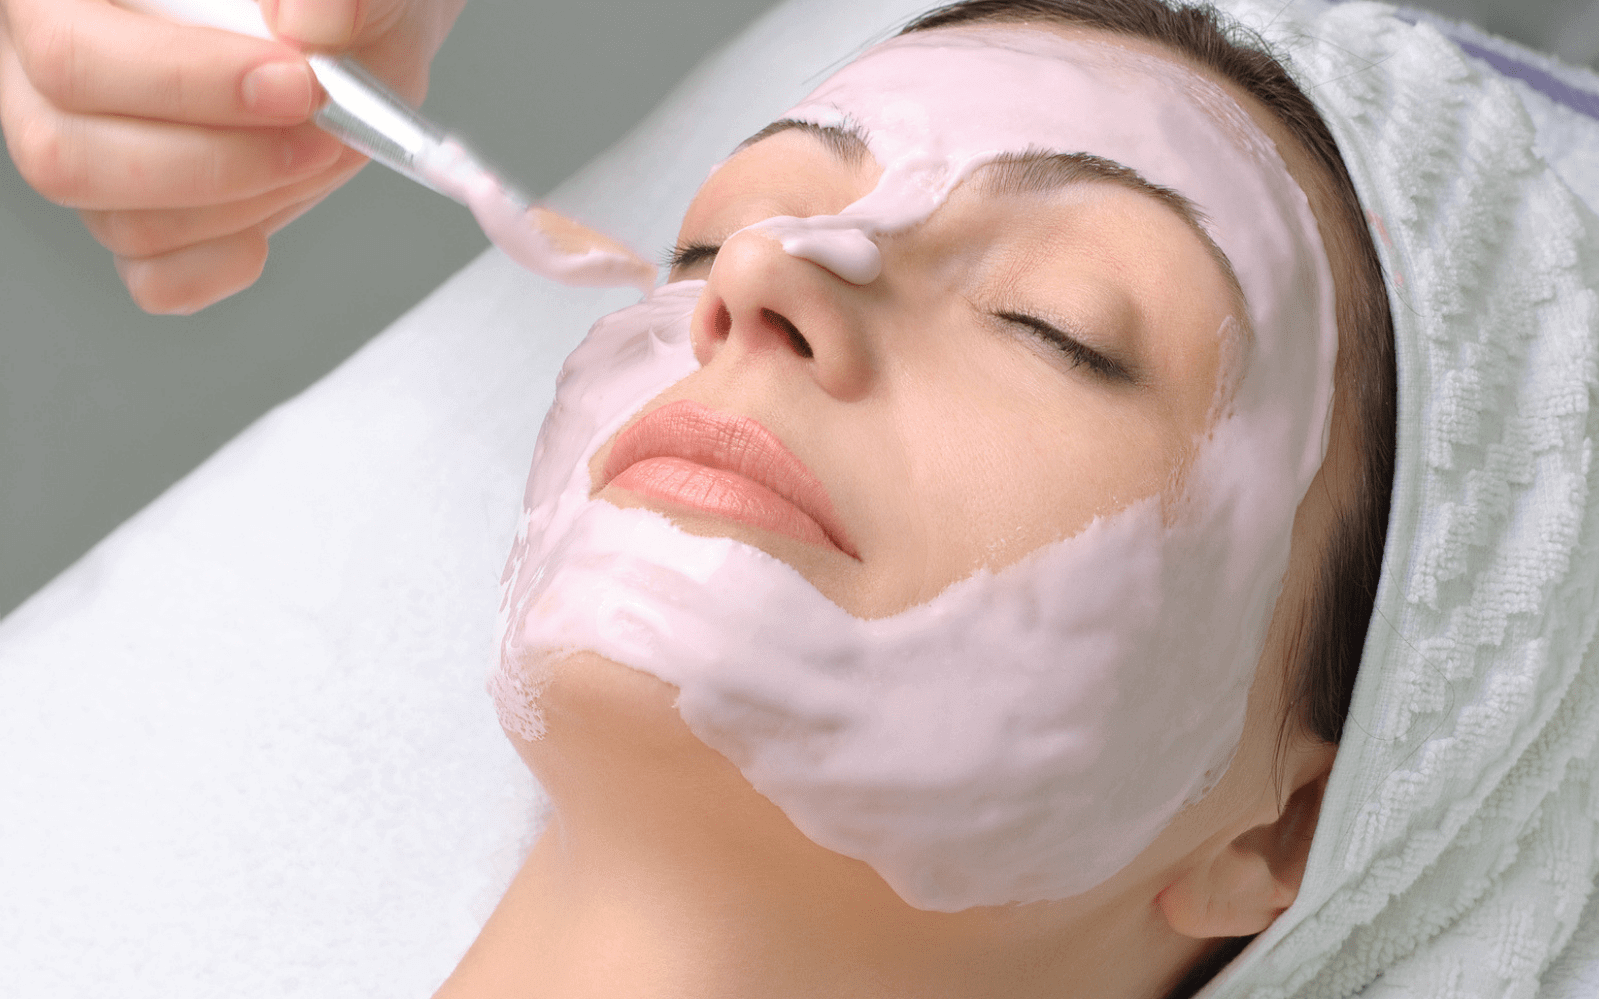 Woman getting beauty treatment